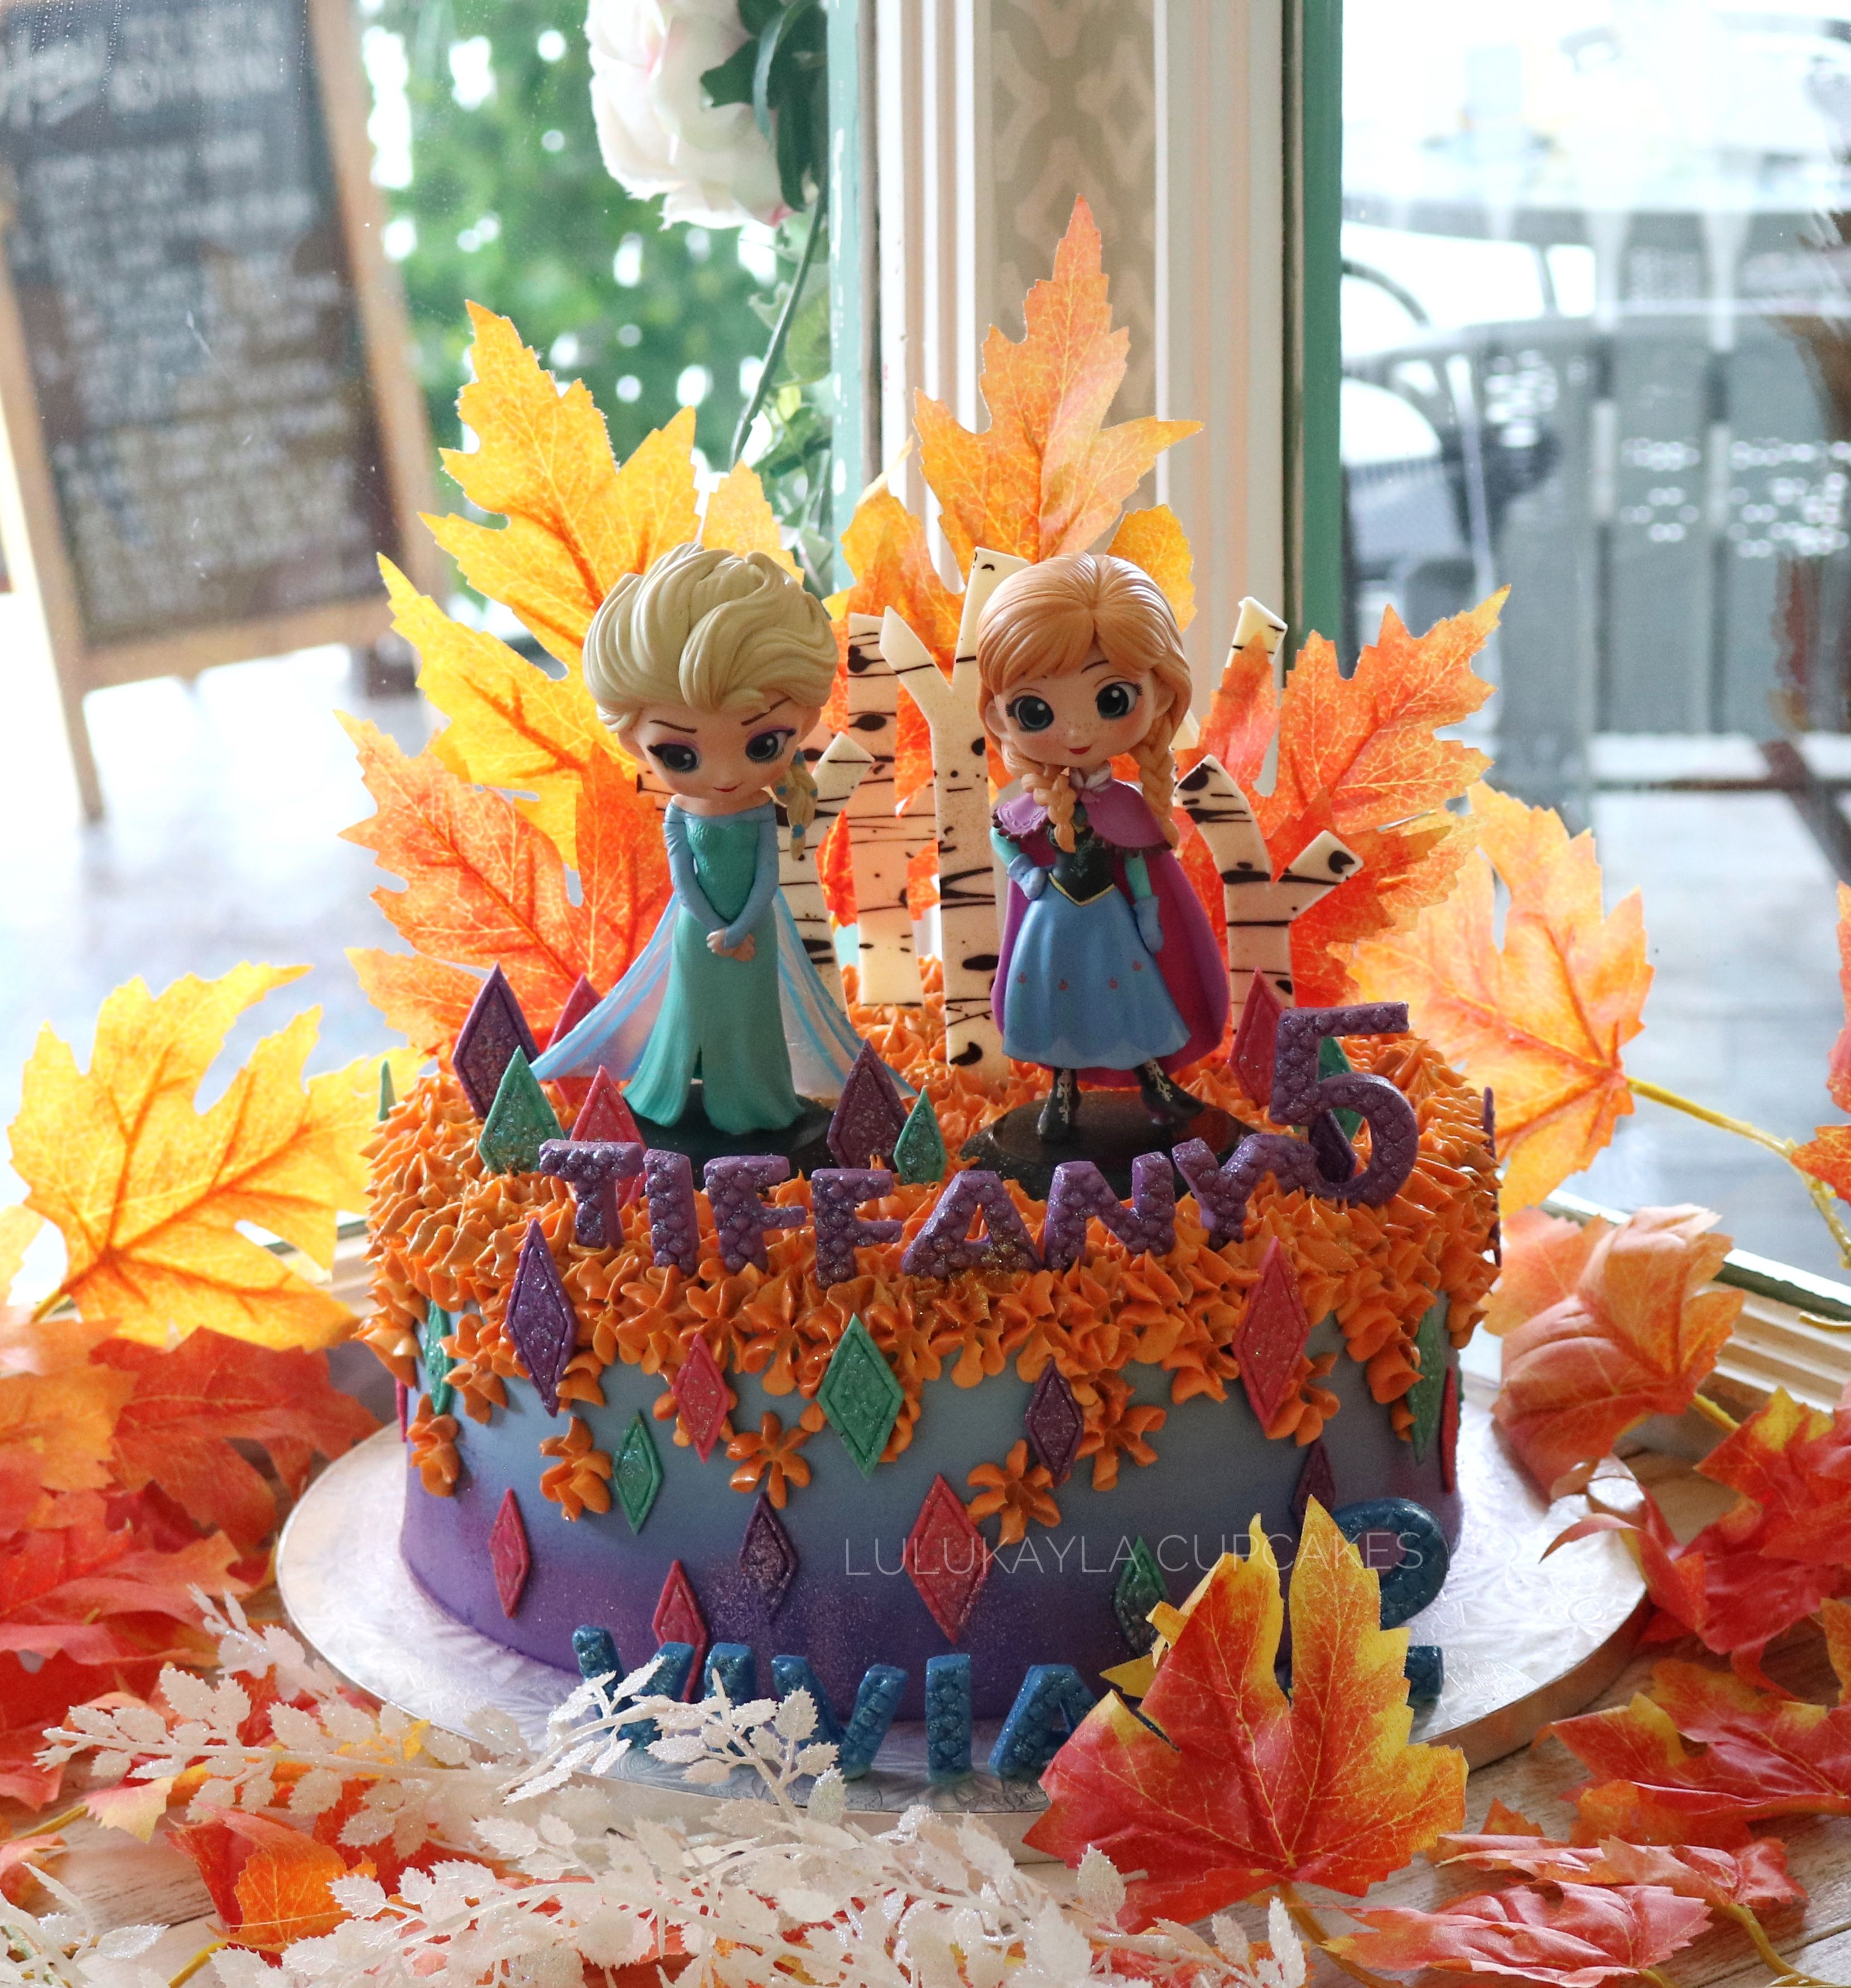 Pin By Lulu Kayla On Buttercream Cake Frozen Party Decorations